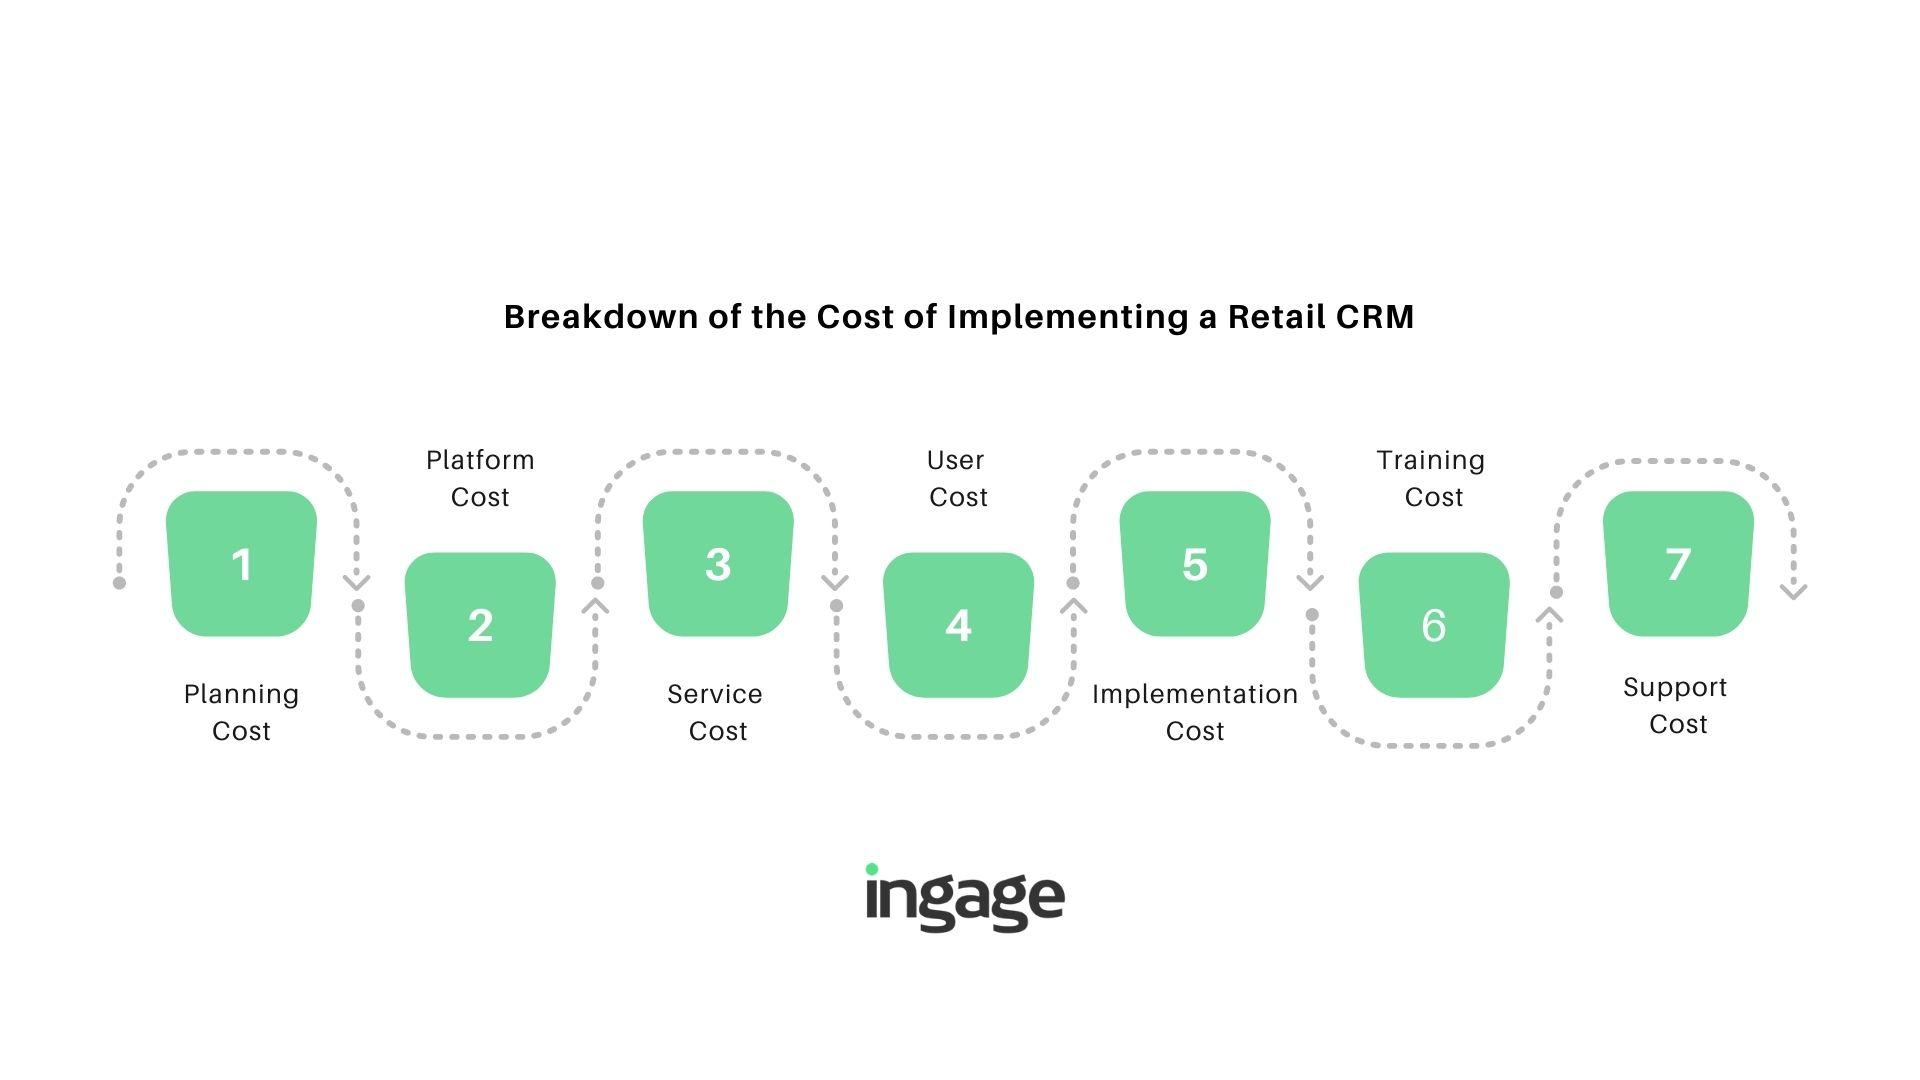 cost of crm implementation breakdown